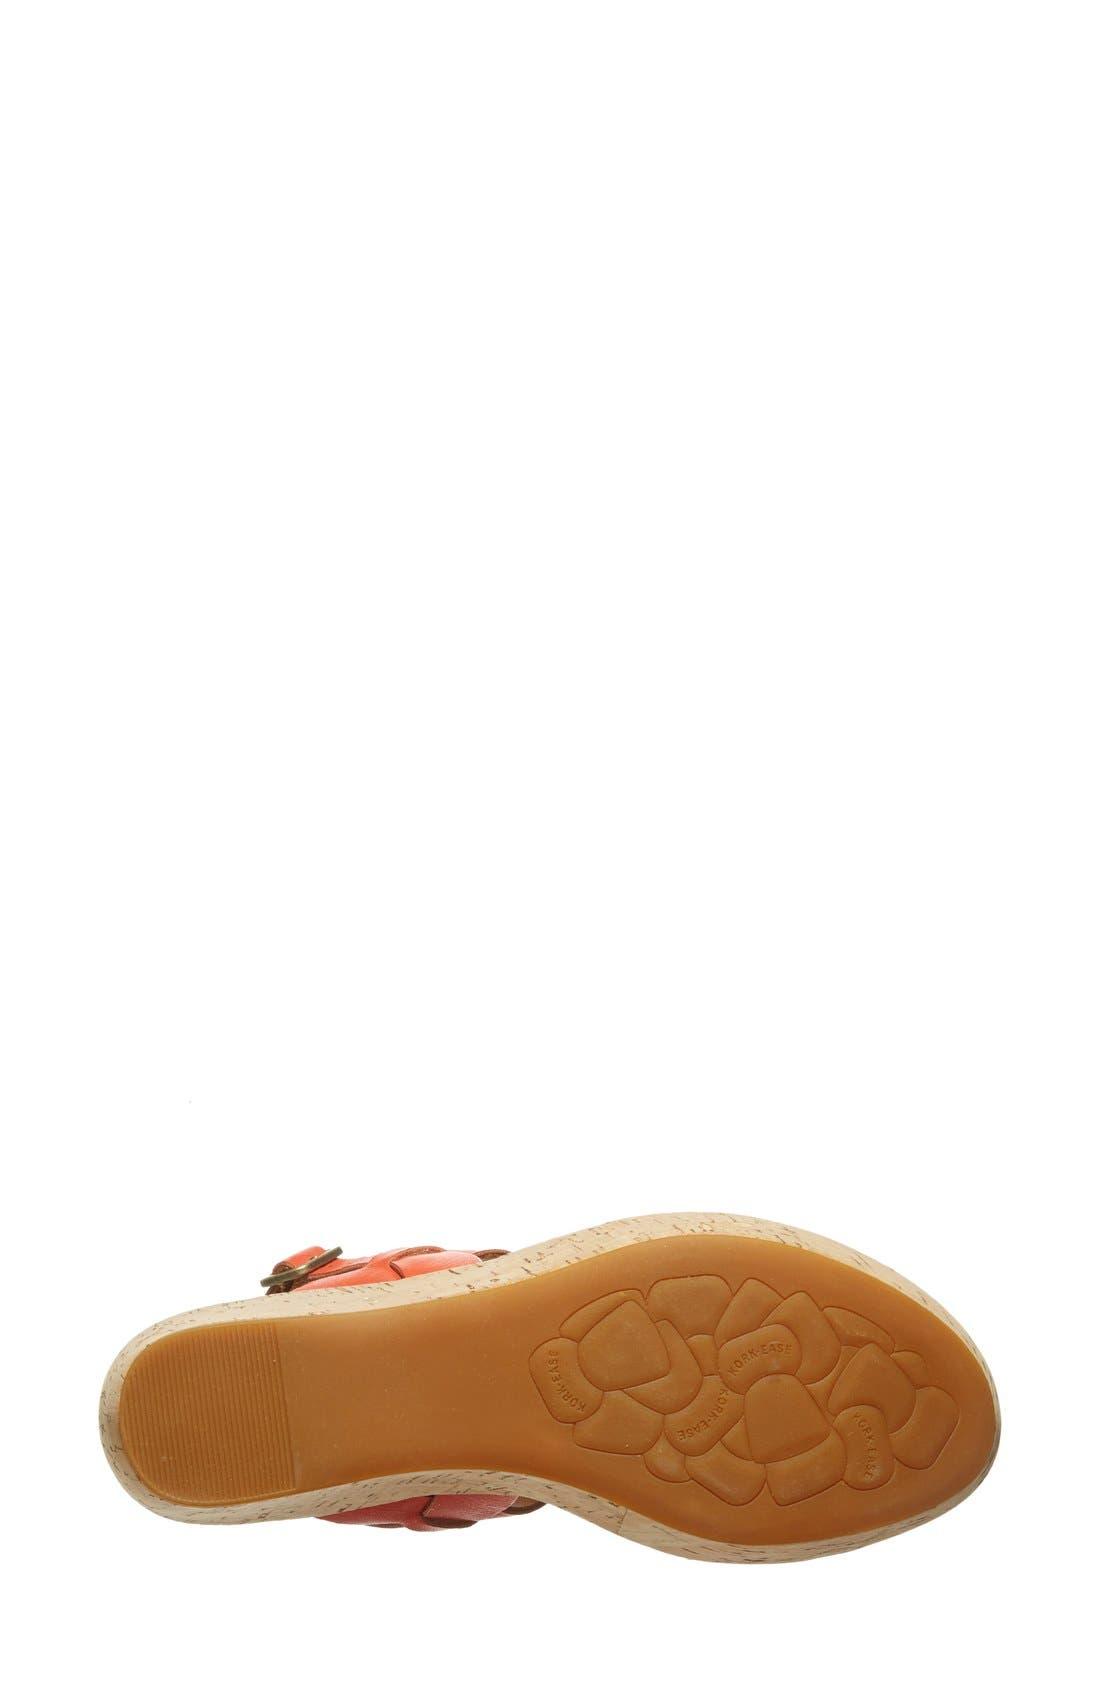 'Austin' Slingback Wedge Sandal,                             Alternate thumbnail 30, color,